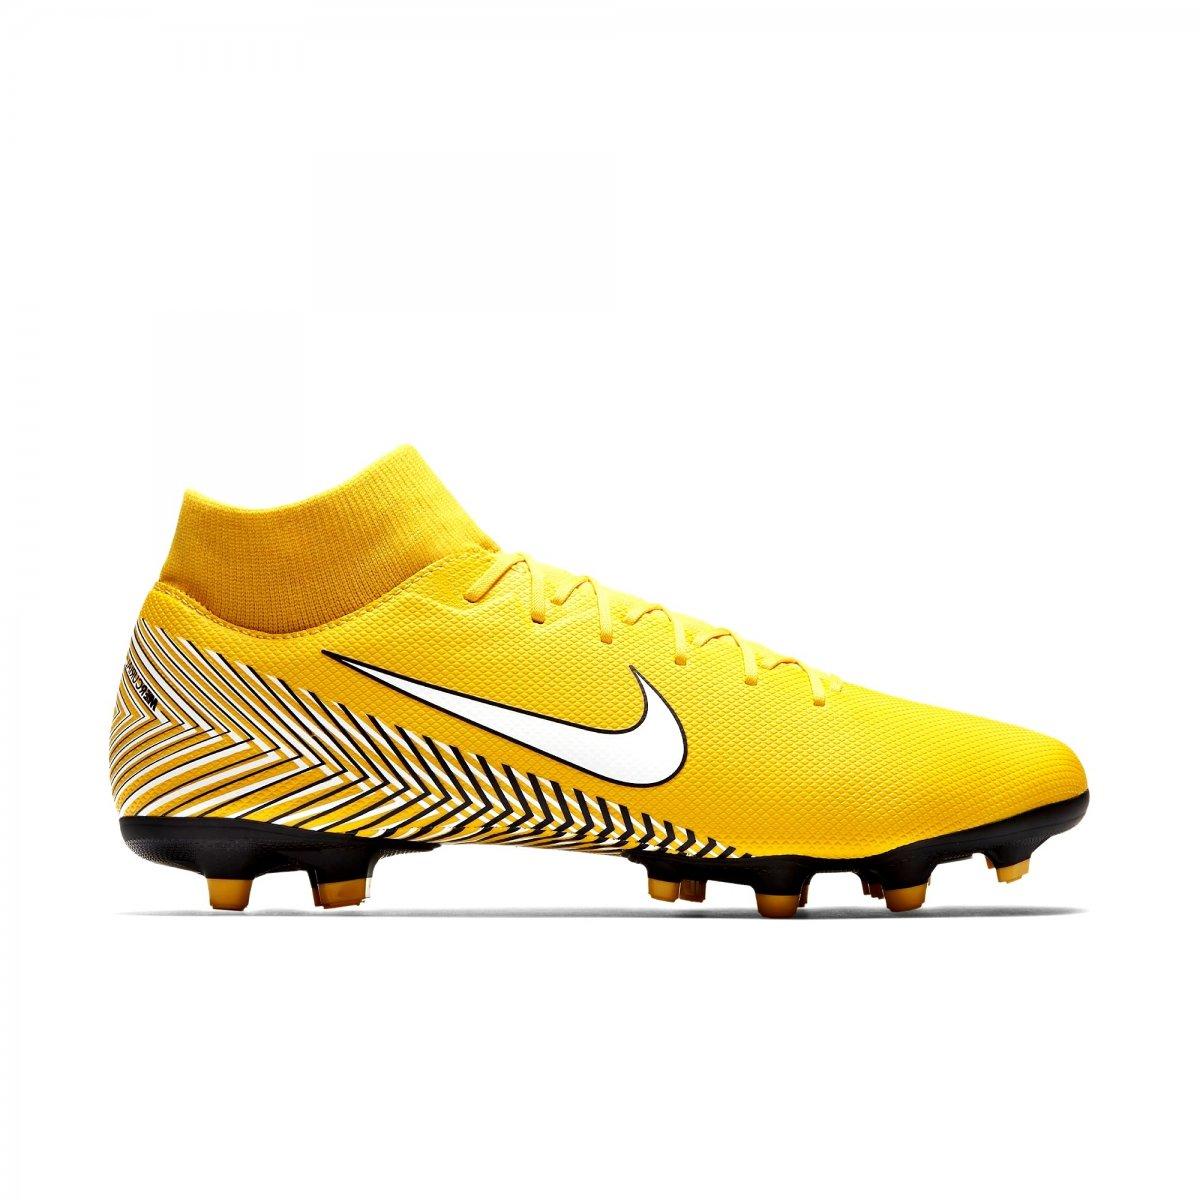 bcb762bd866ff ... Chuteira Campo Nike Mercurial Superfly VI Academy Neymar. Passe ...